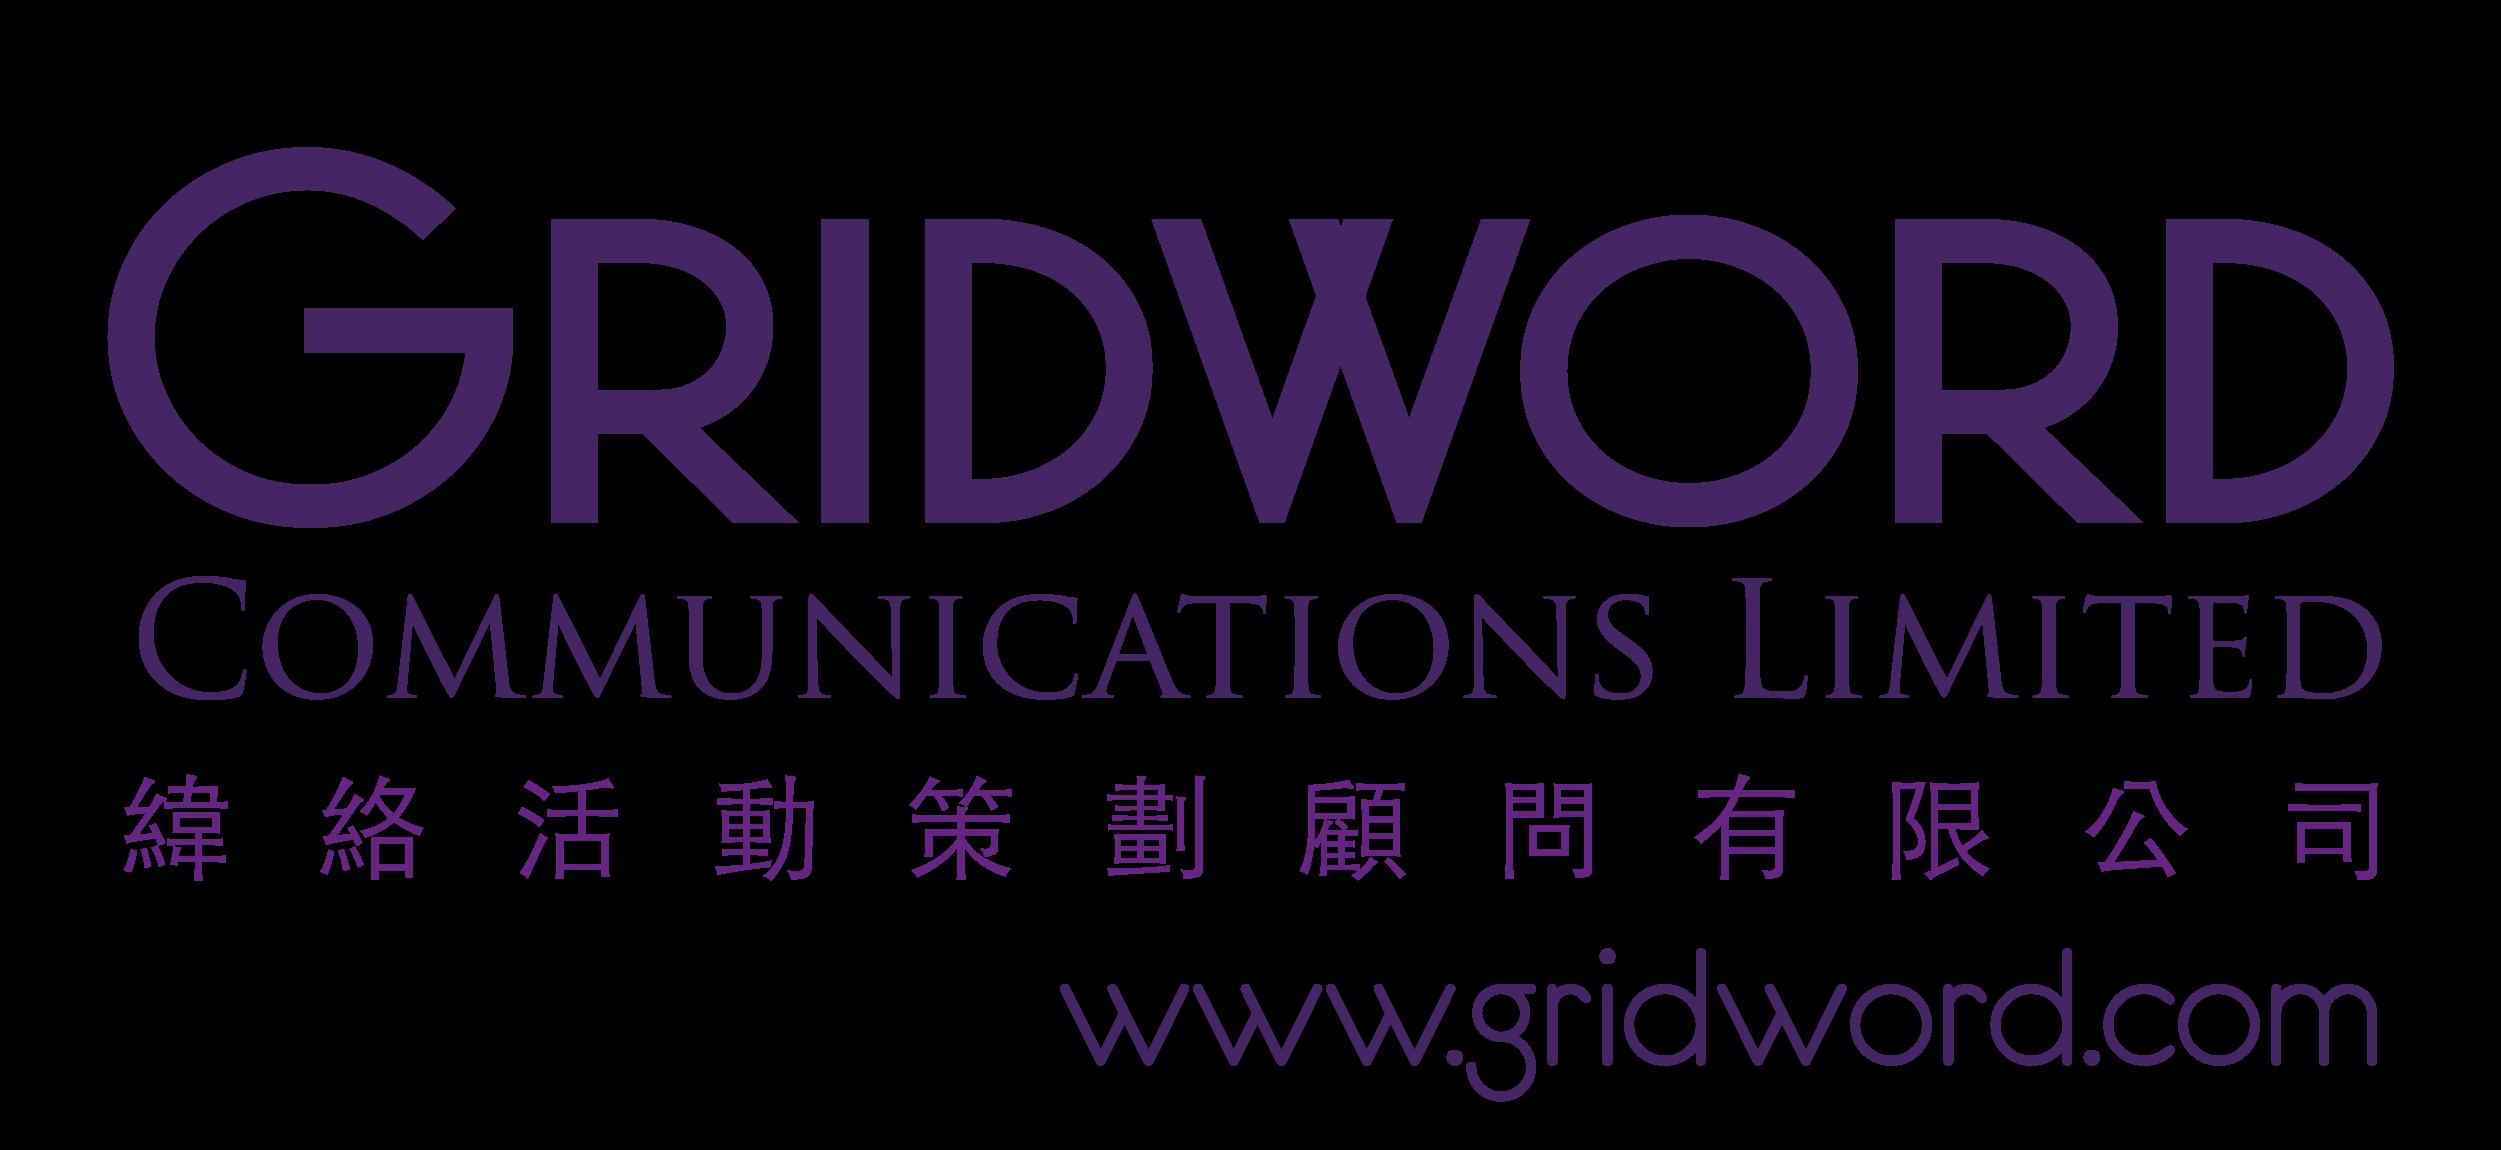 Gridword Communication Ltd